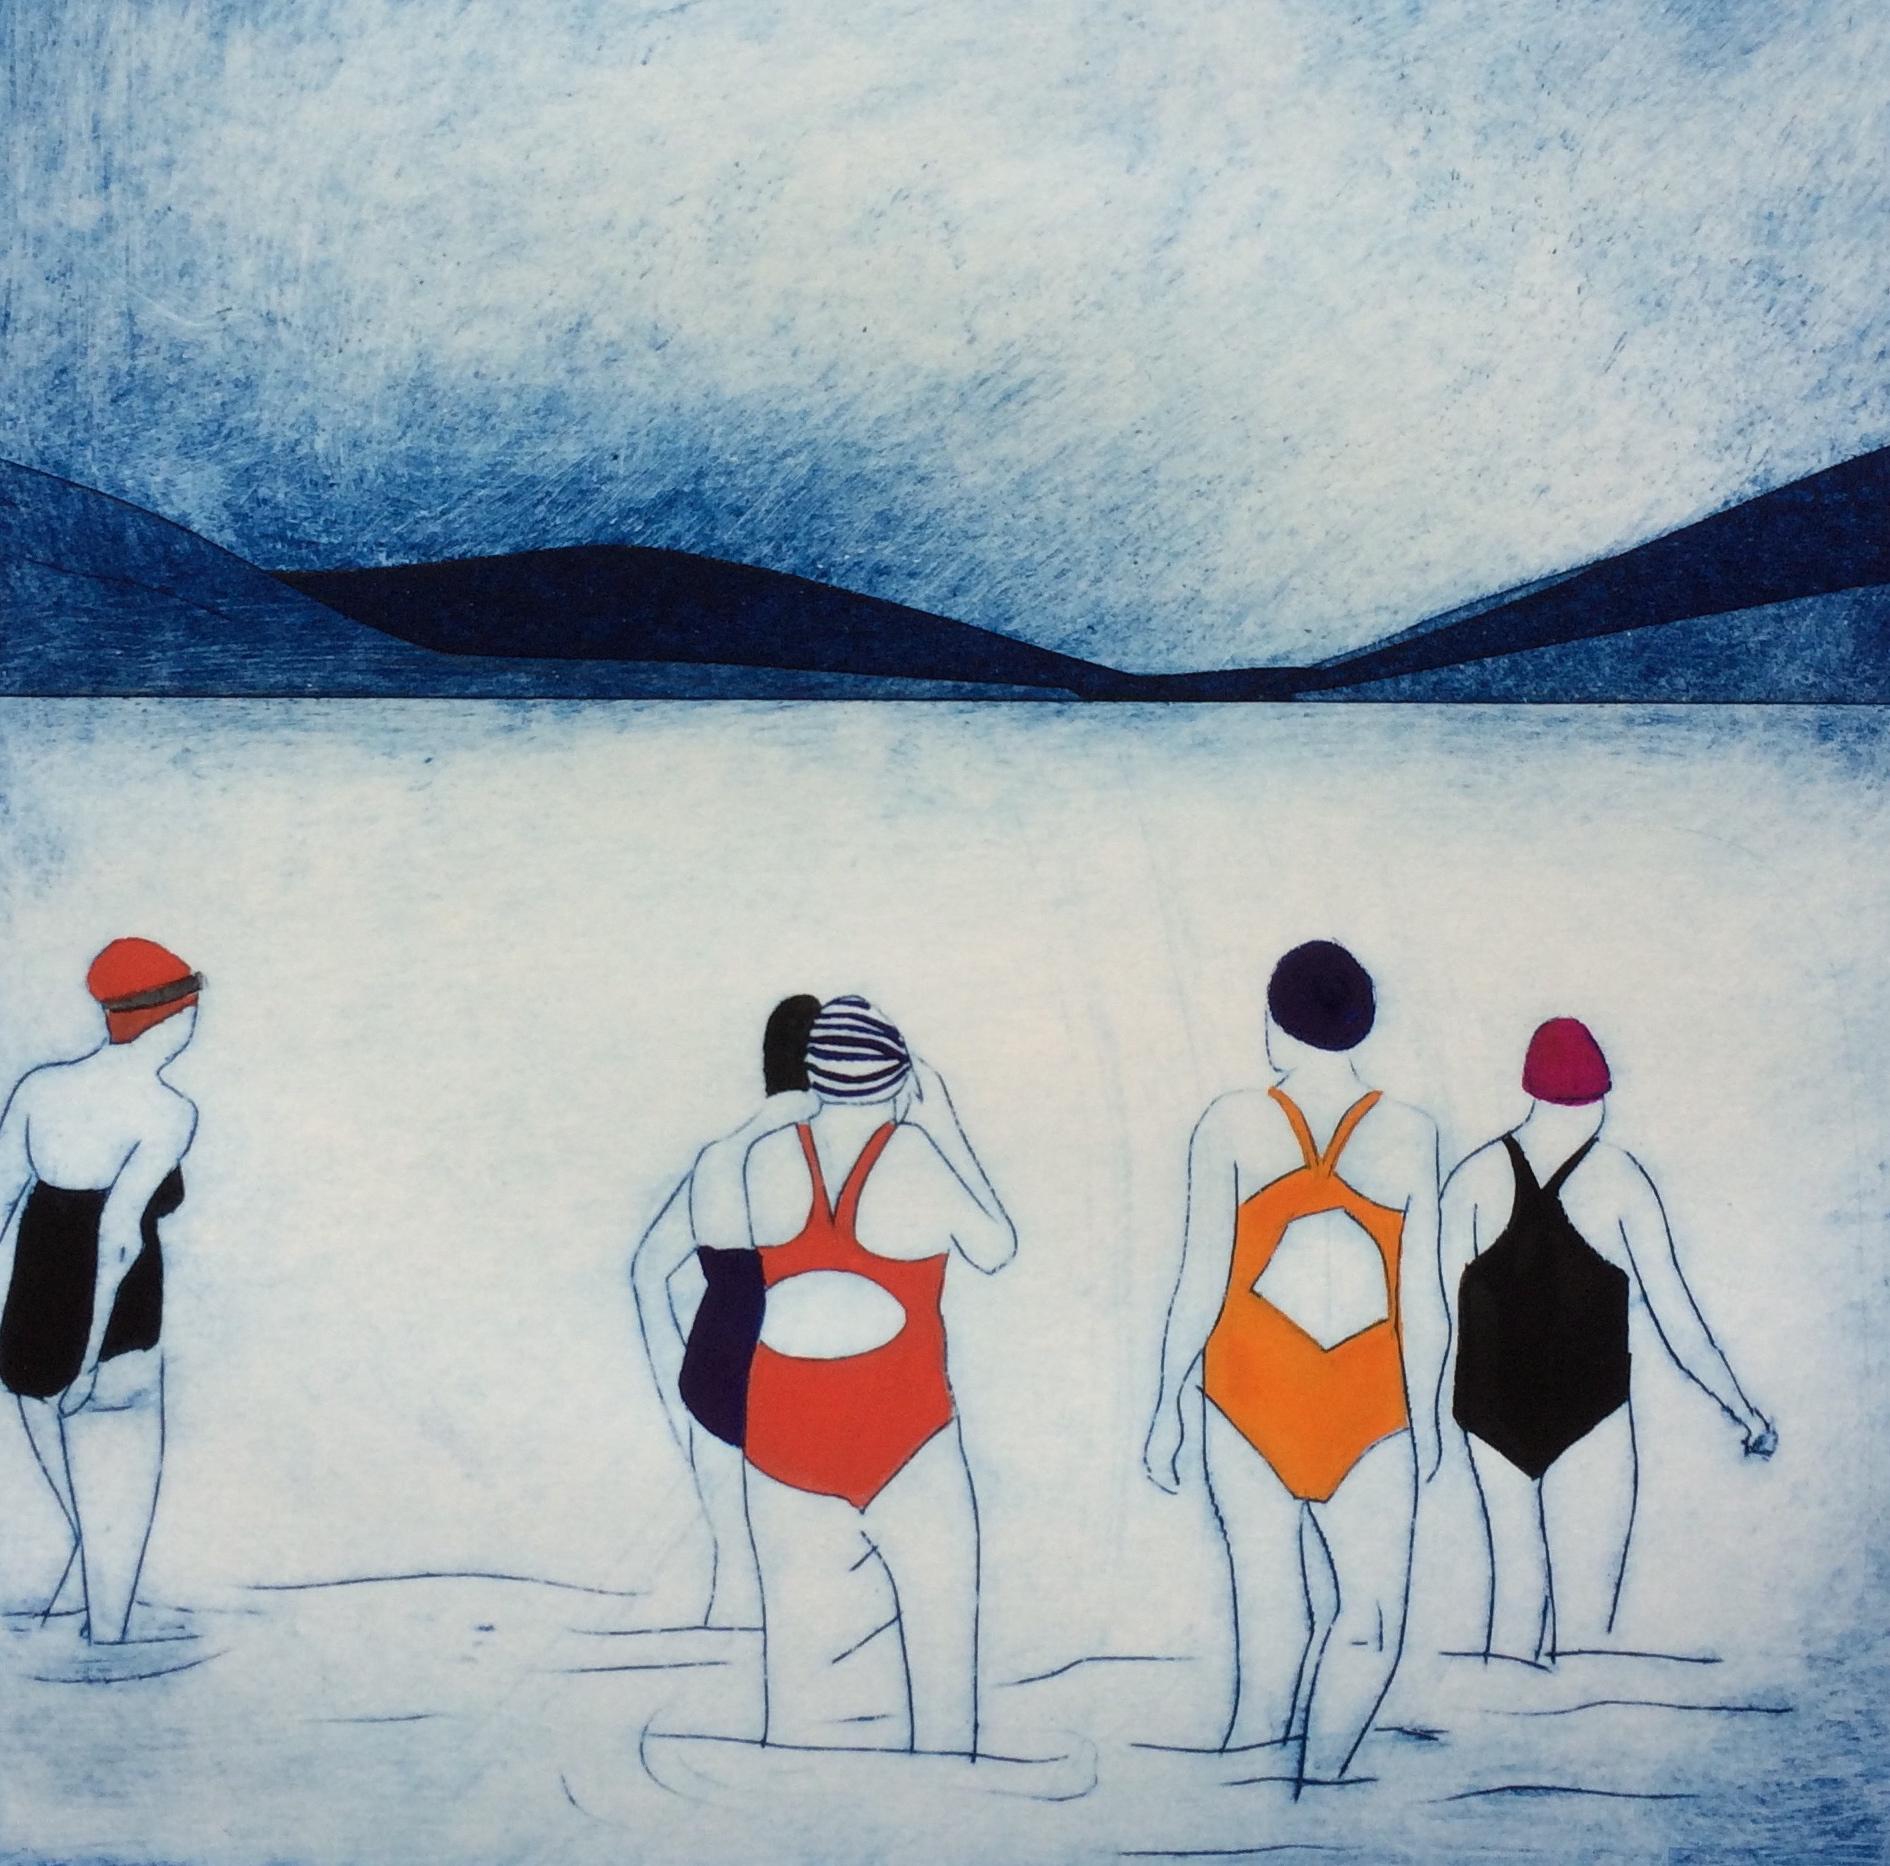 Swim Club  Collagraph print with gouache  30x30cm  Unframed £80  Framed £120